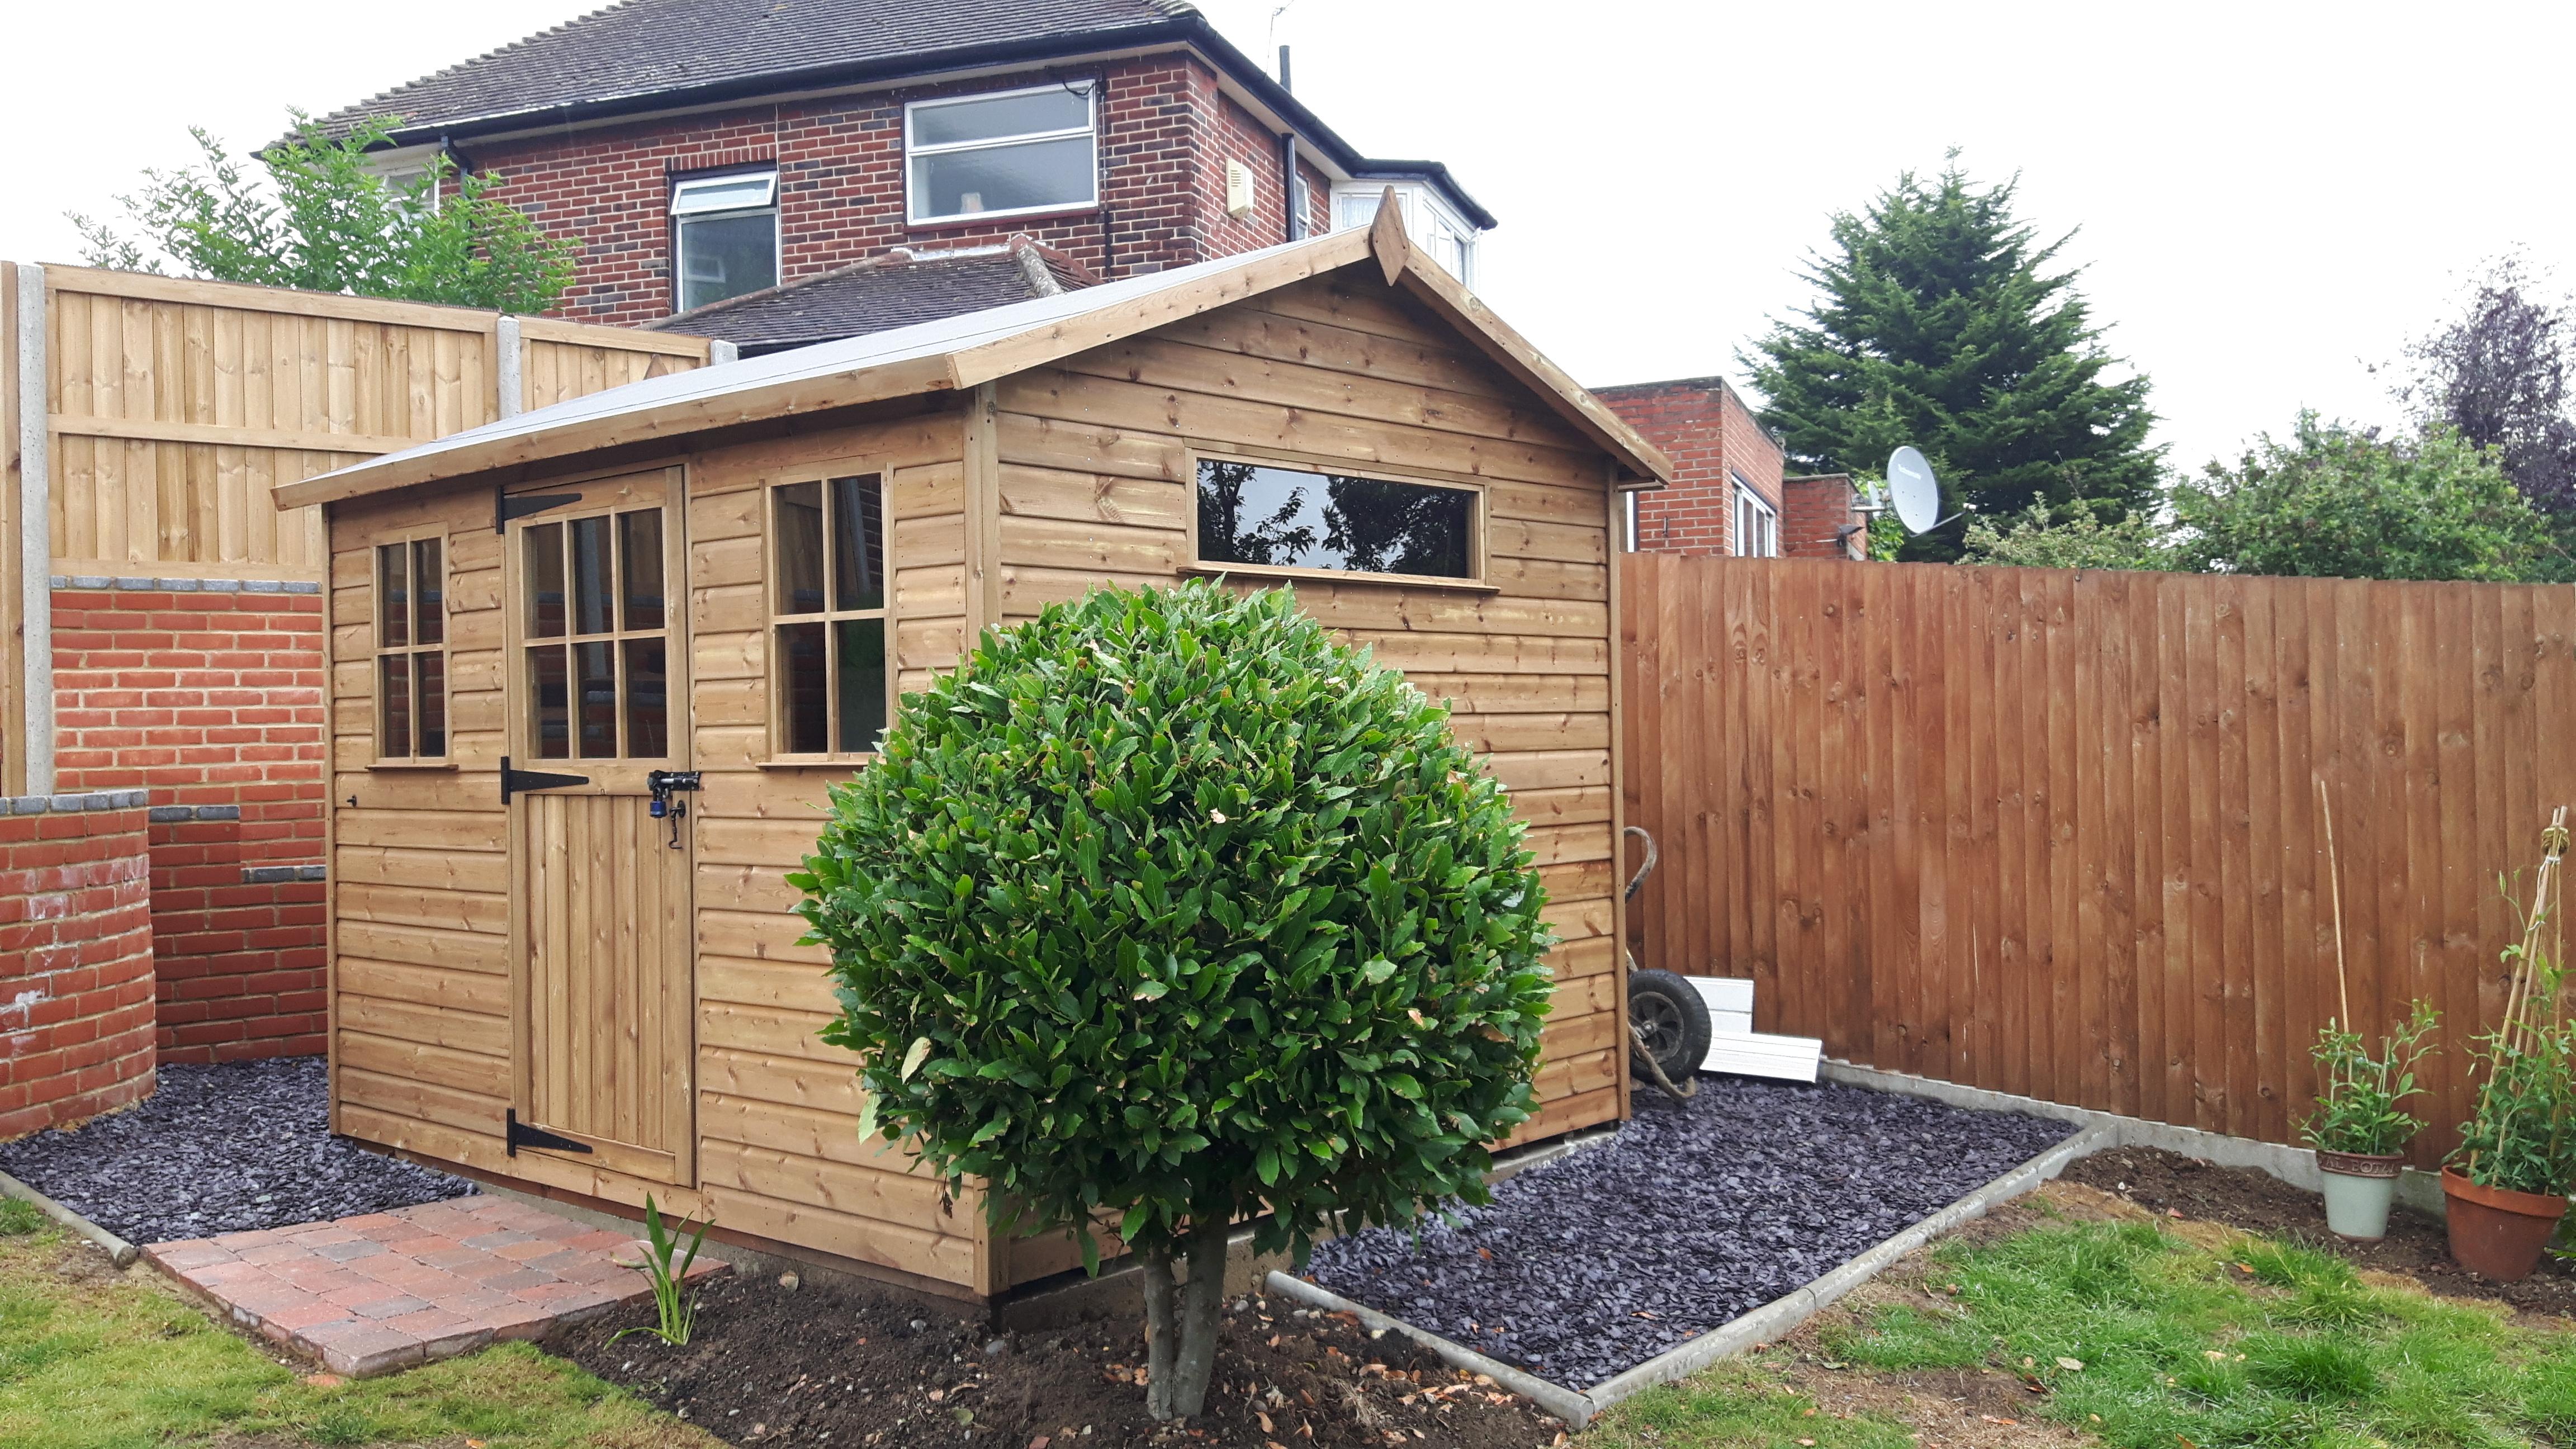 Apex garden shed